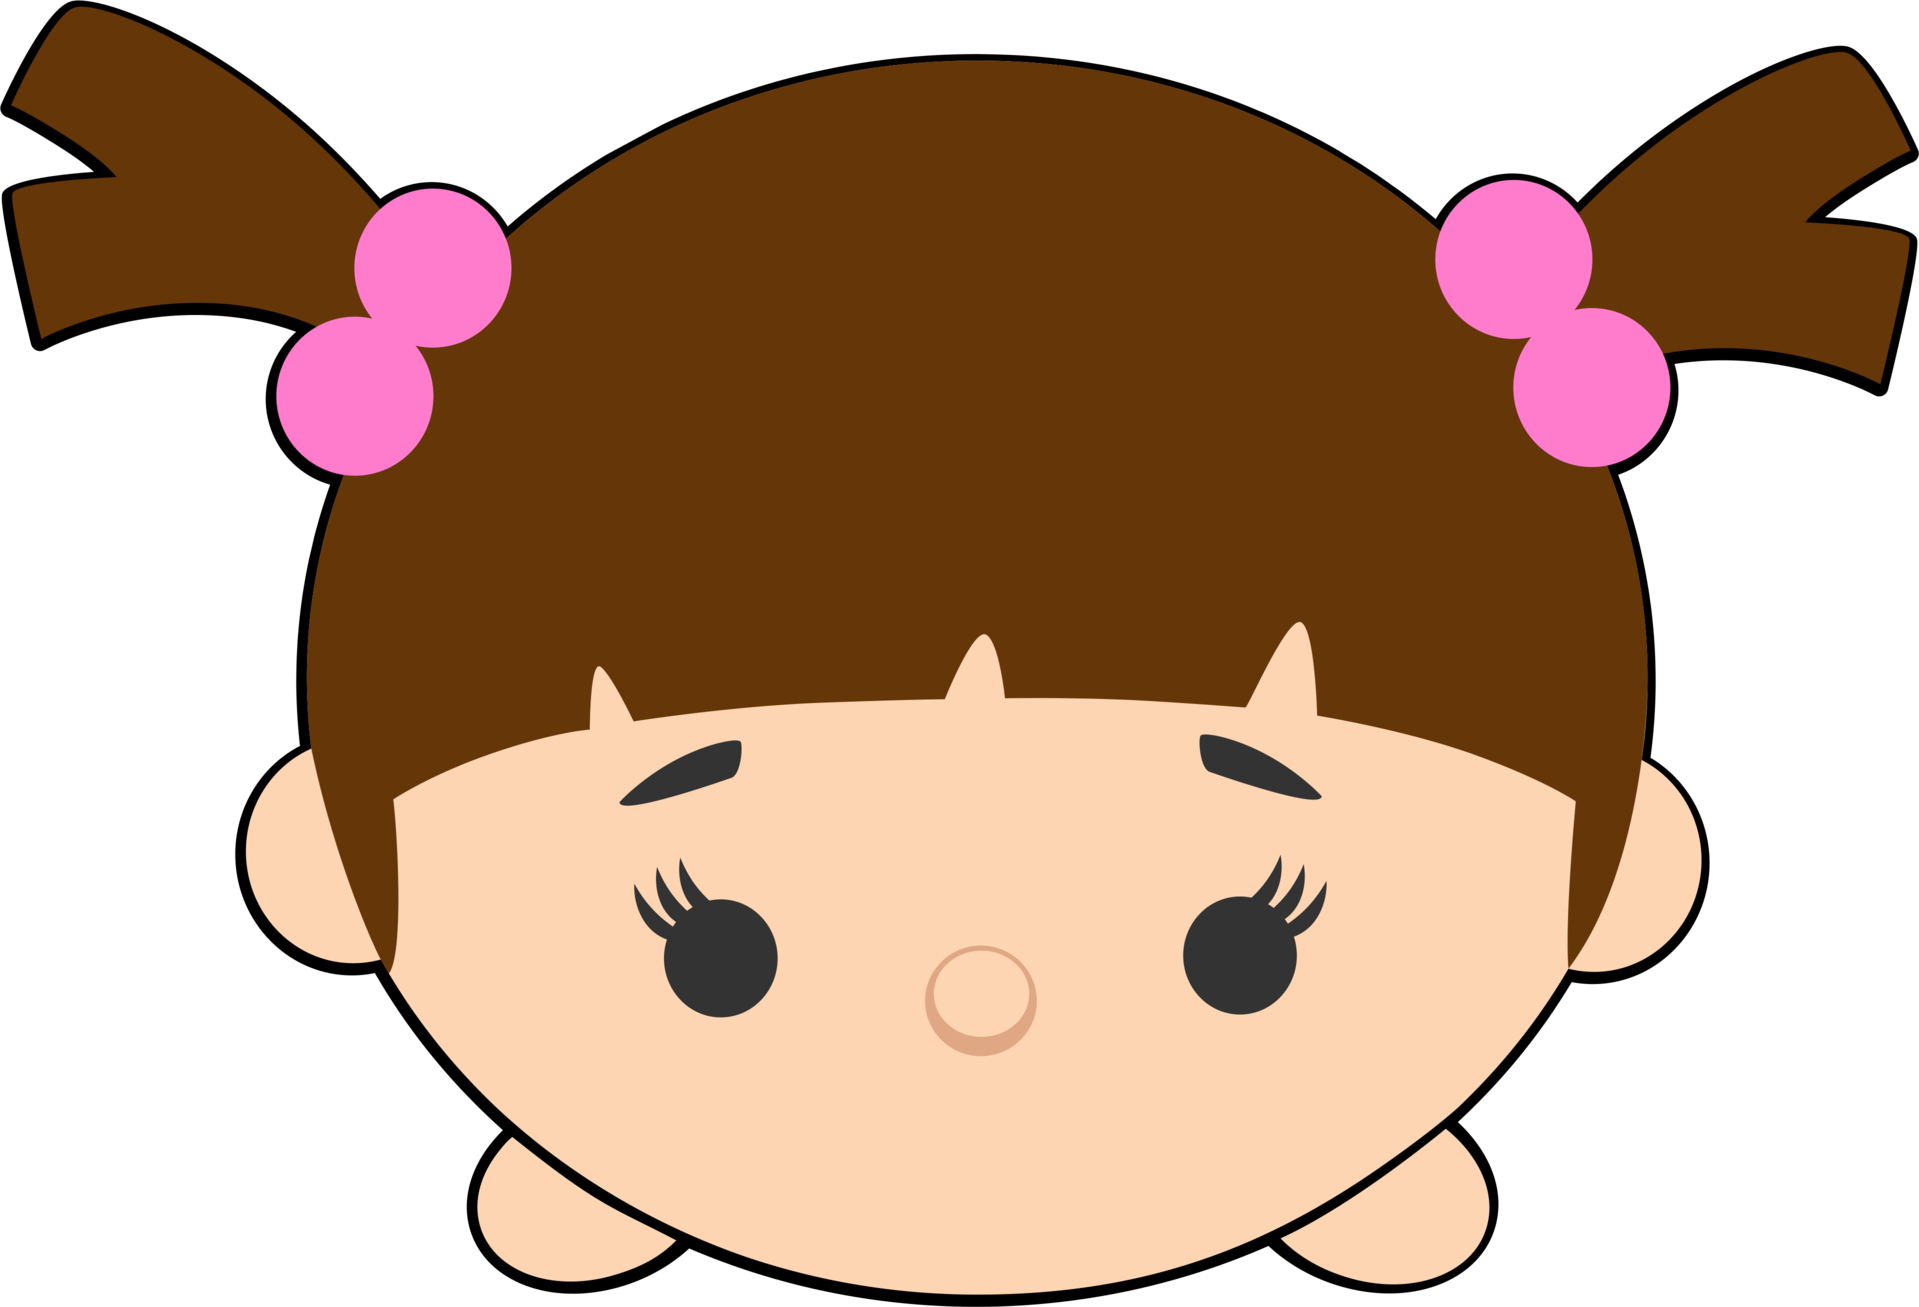 Disney Tsum Tsum Clipart 9: Disney Tsum Tsum Clipart 60